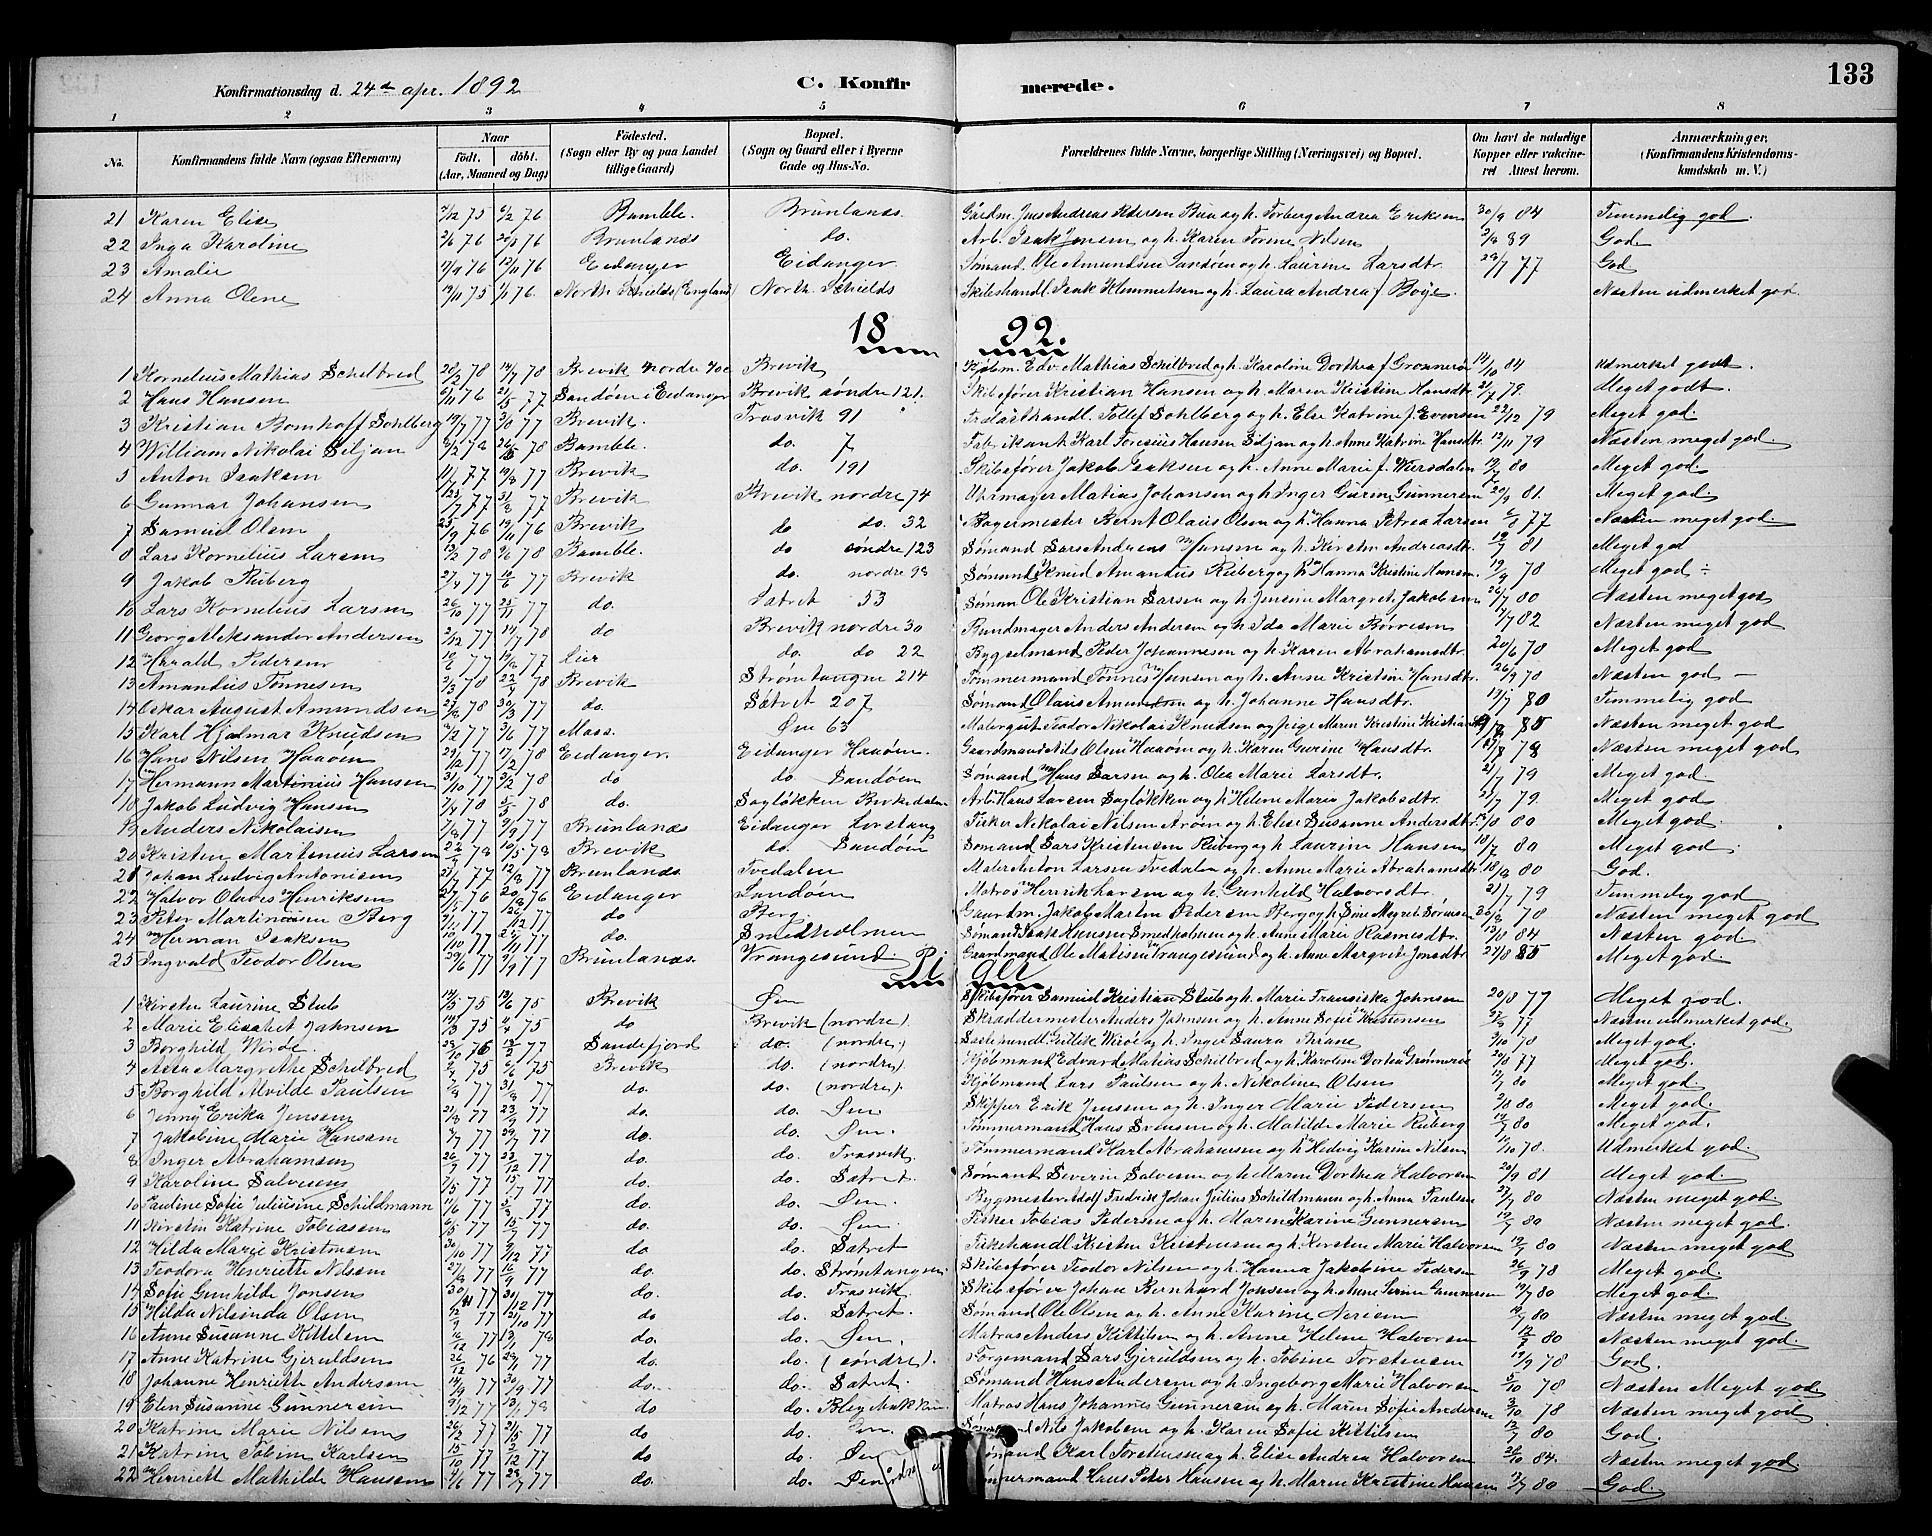 SAKO, Brevik kirkebøker, G/Ga/L0004: Klokkerbok nr. 4, 1882-1900, s. 133